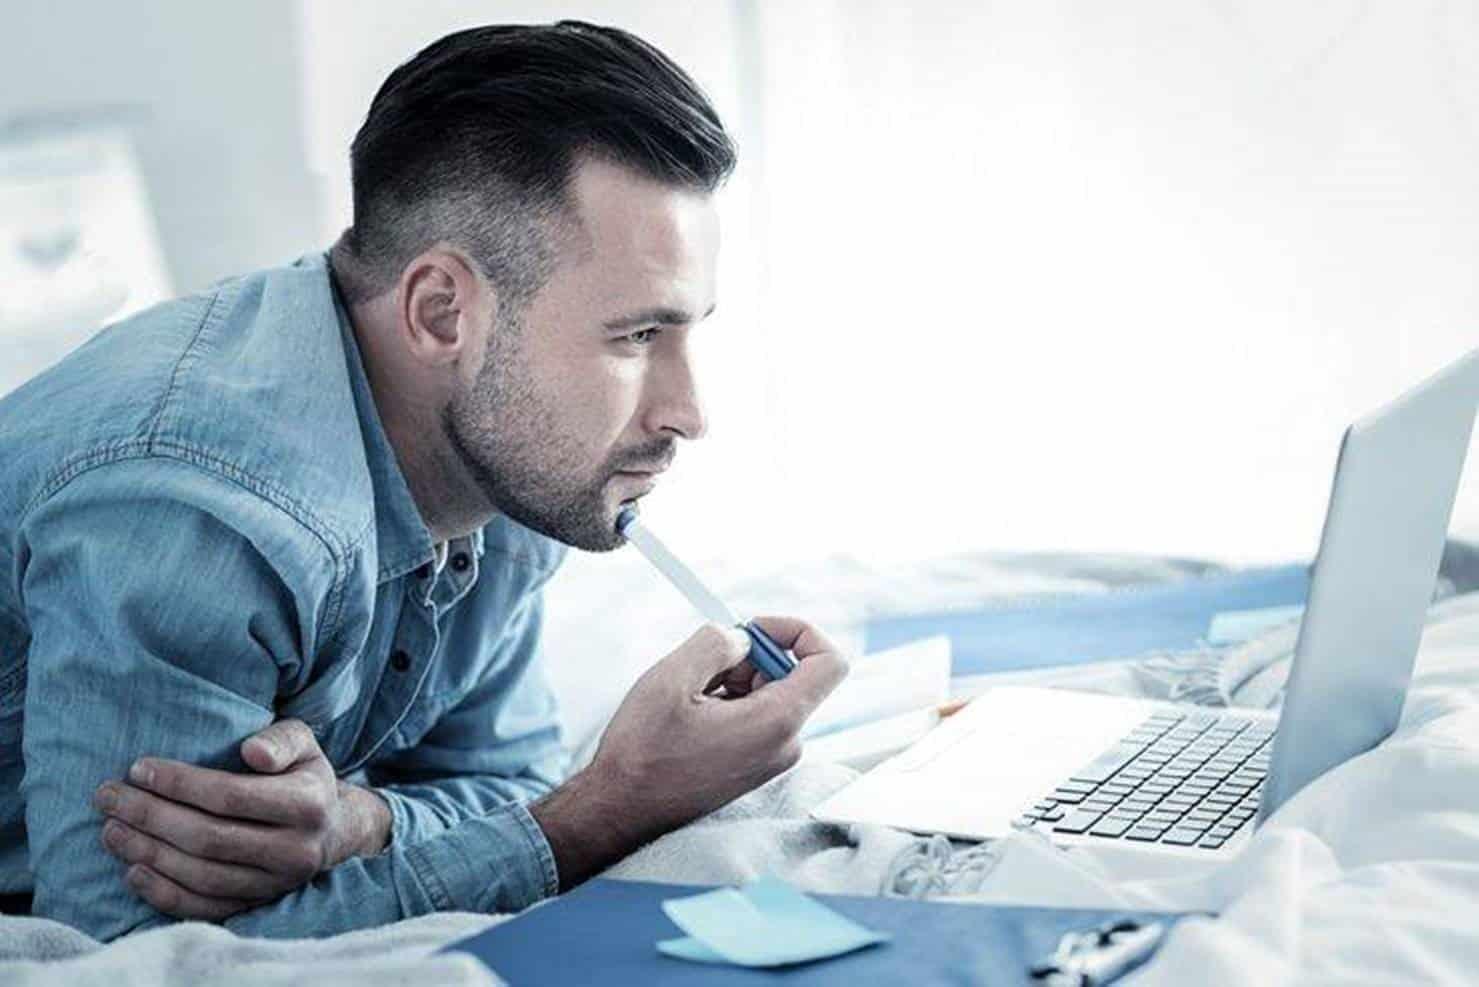 Confira 10 dicas infalíveis de como arrumar emprego rápido